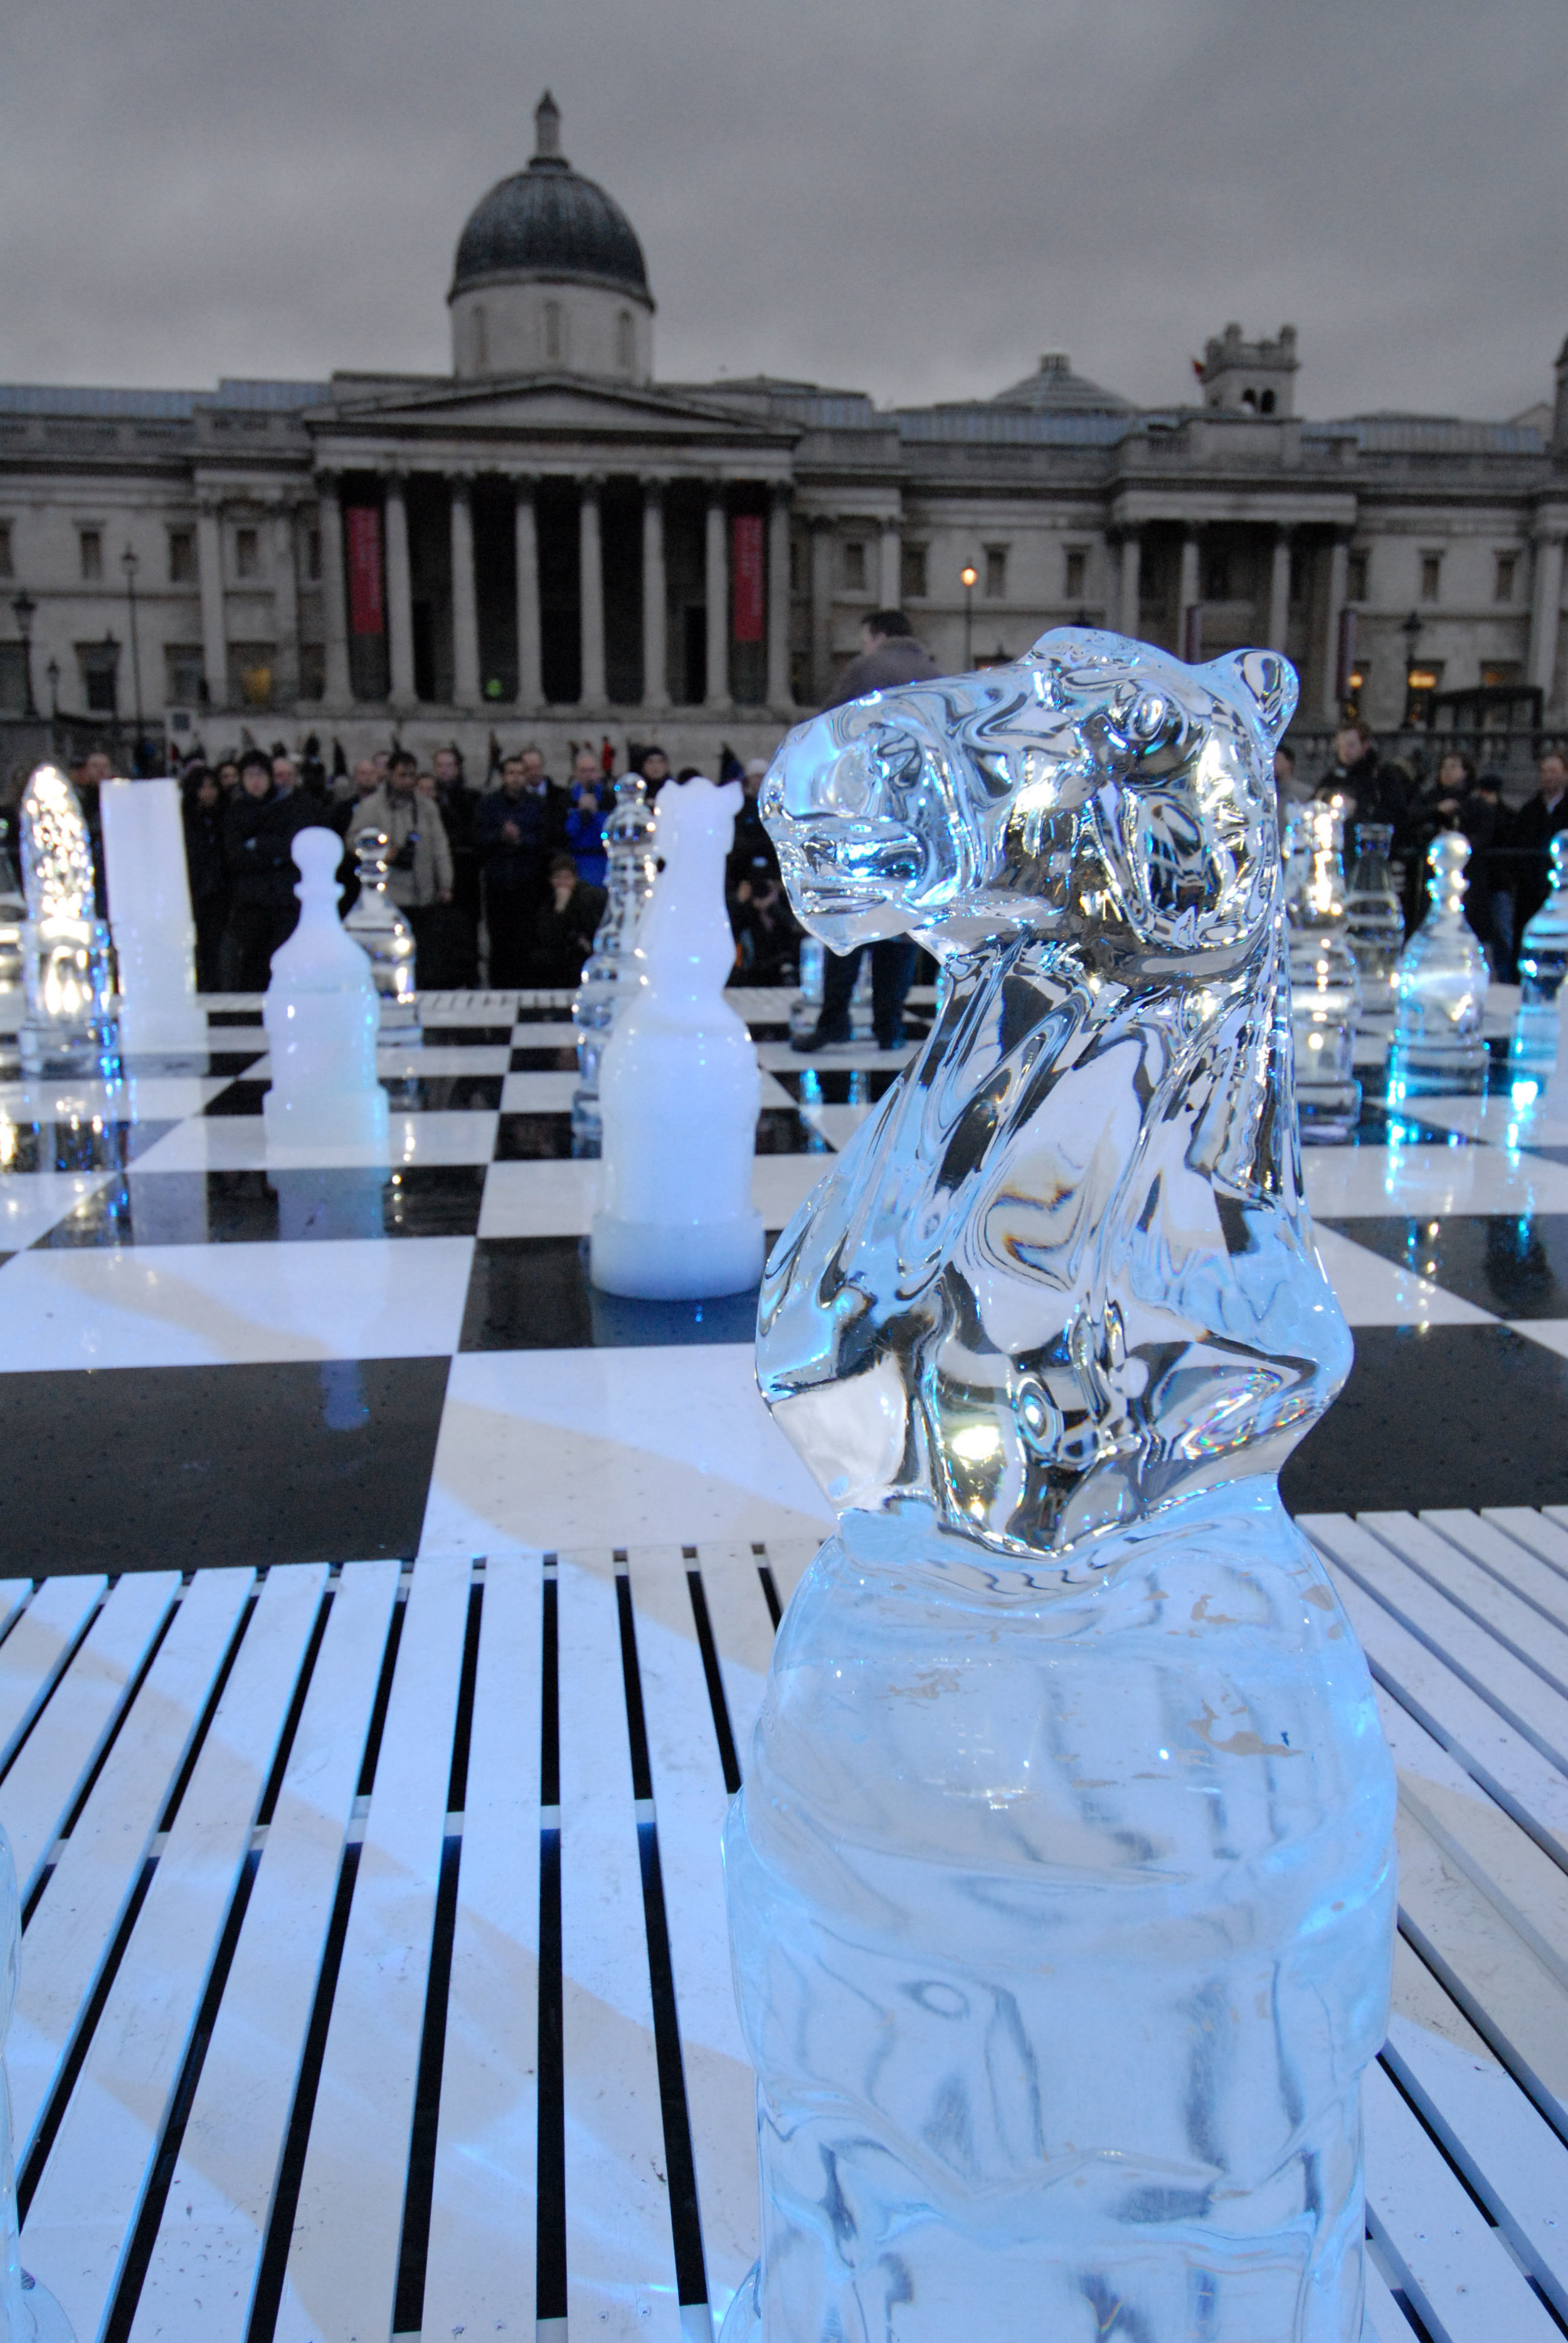 RWF2007 Chess Match 2007-01-11 09-47-31.jpg